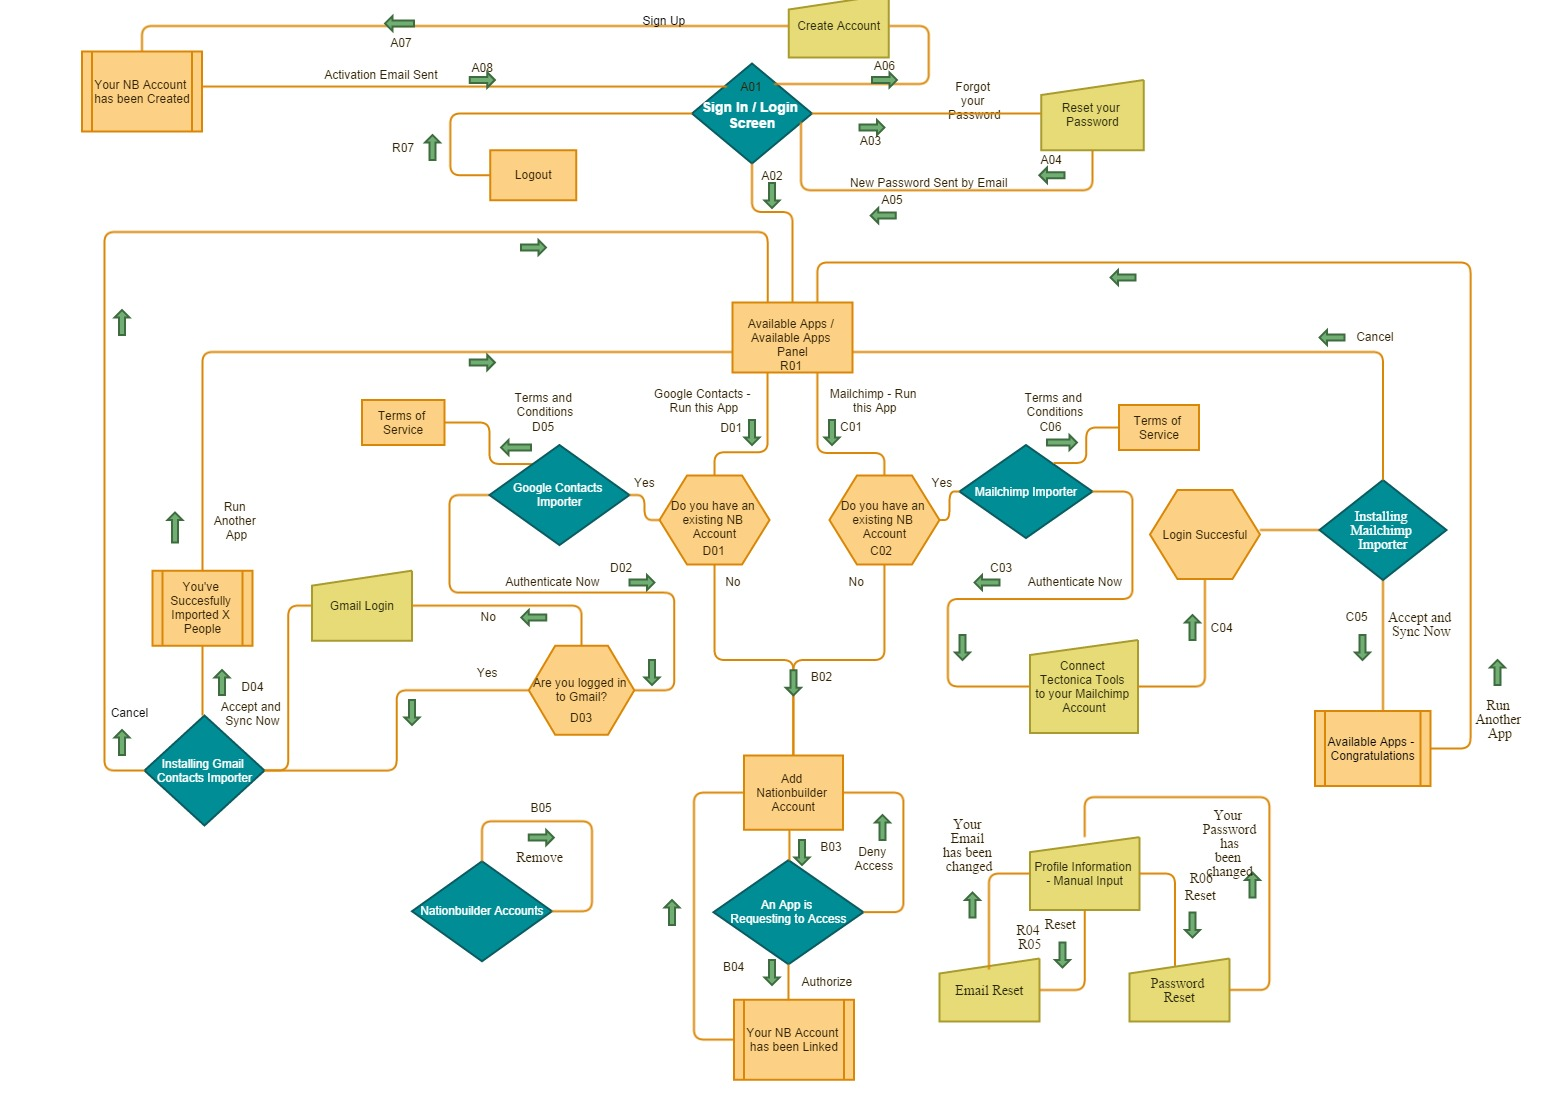 Tectonica_Tools_Process_Flowchart.jpg